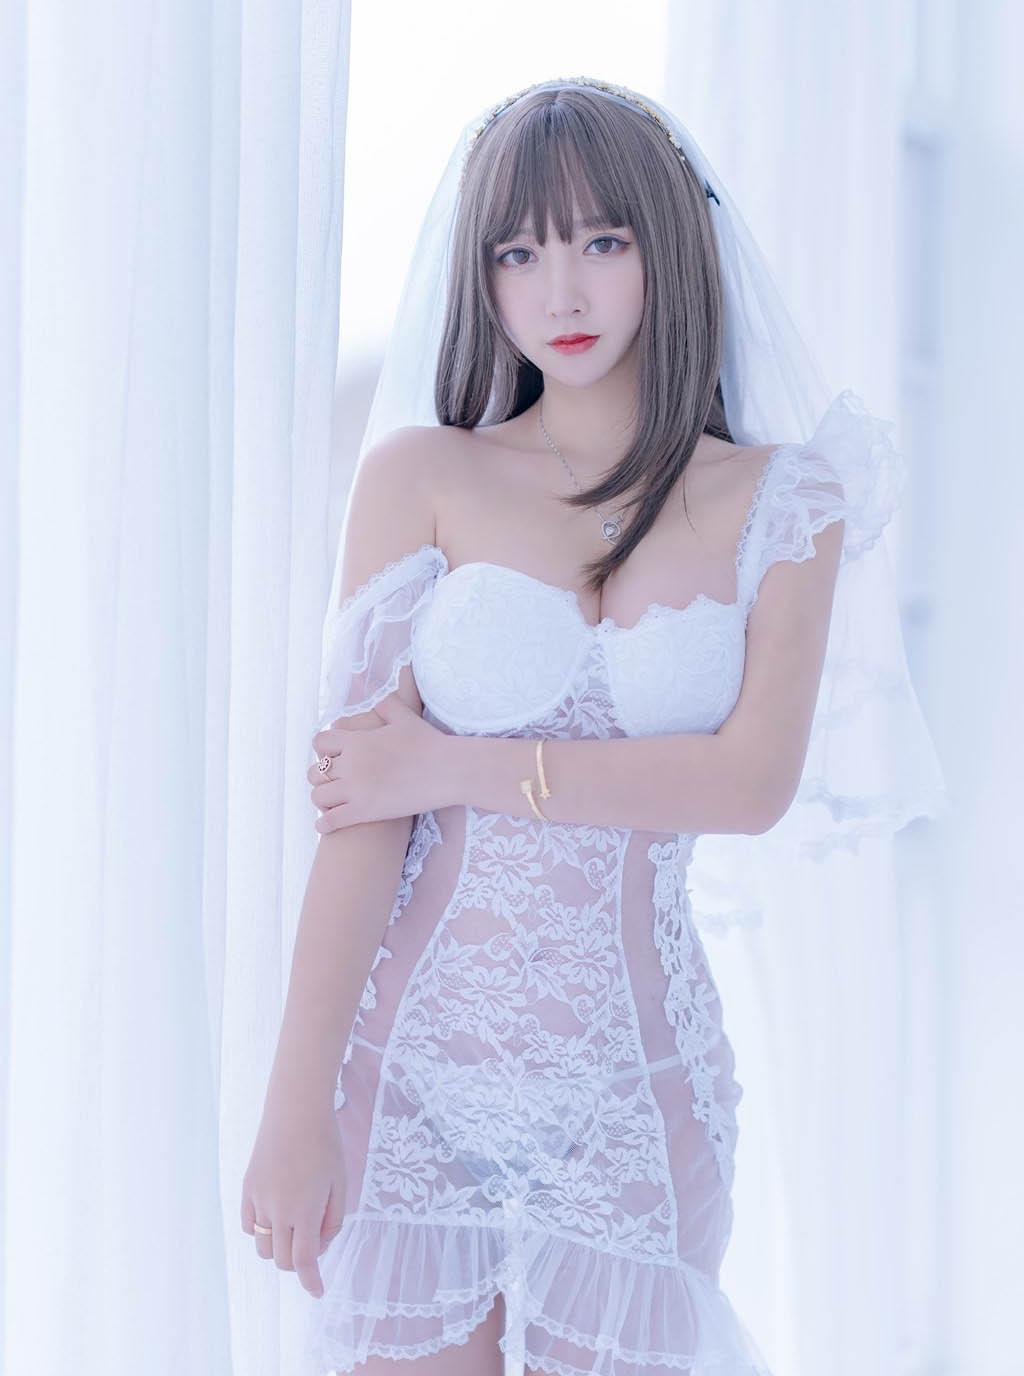 cosplay 白雪姬